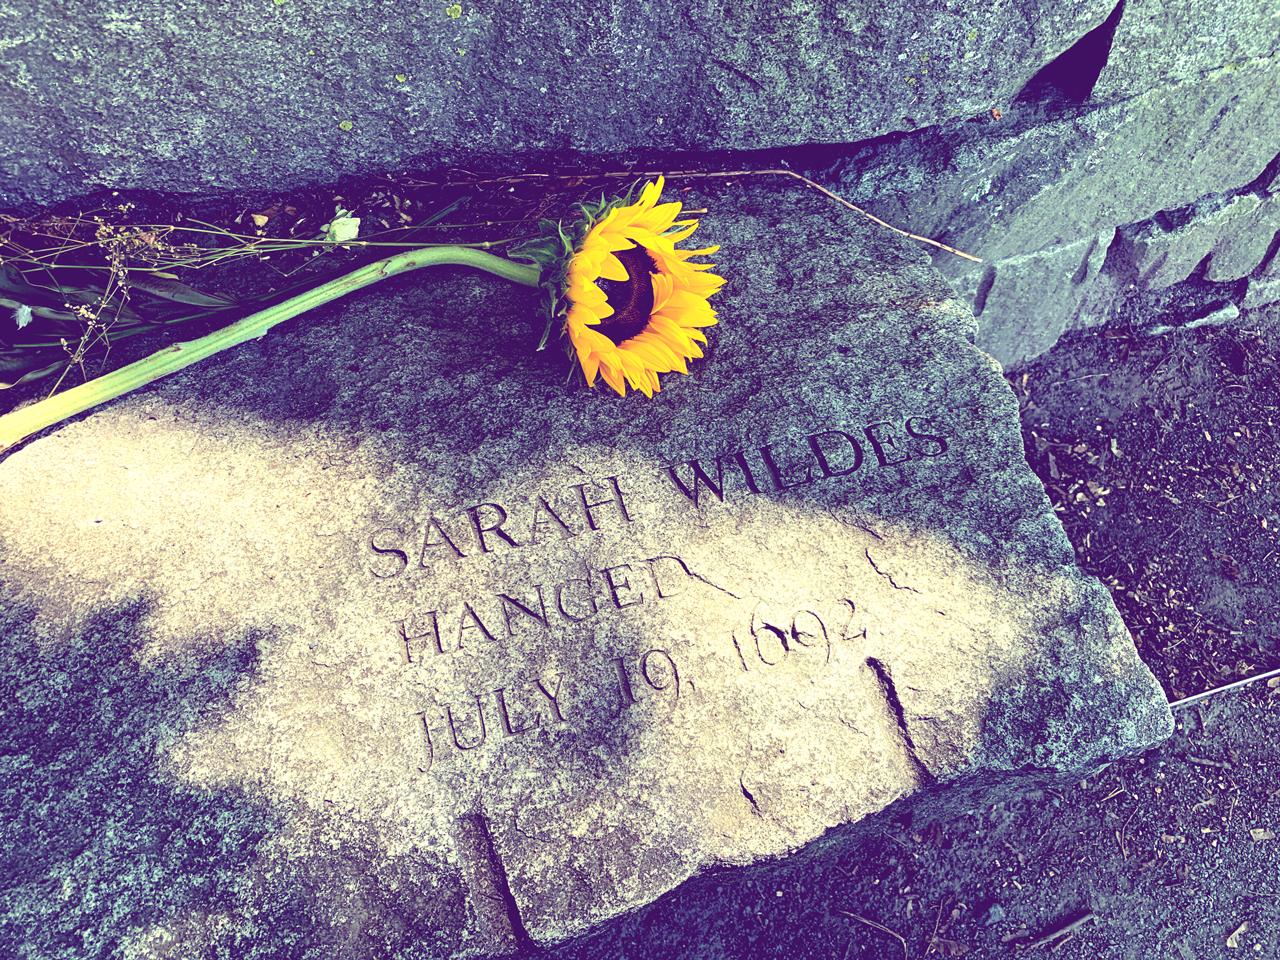 salem-witch-trials-memorial-massachusetts-sarah-wildes-1280x960